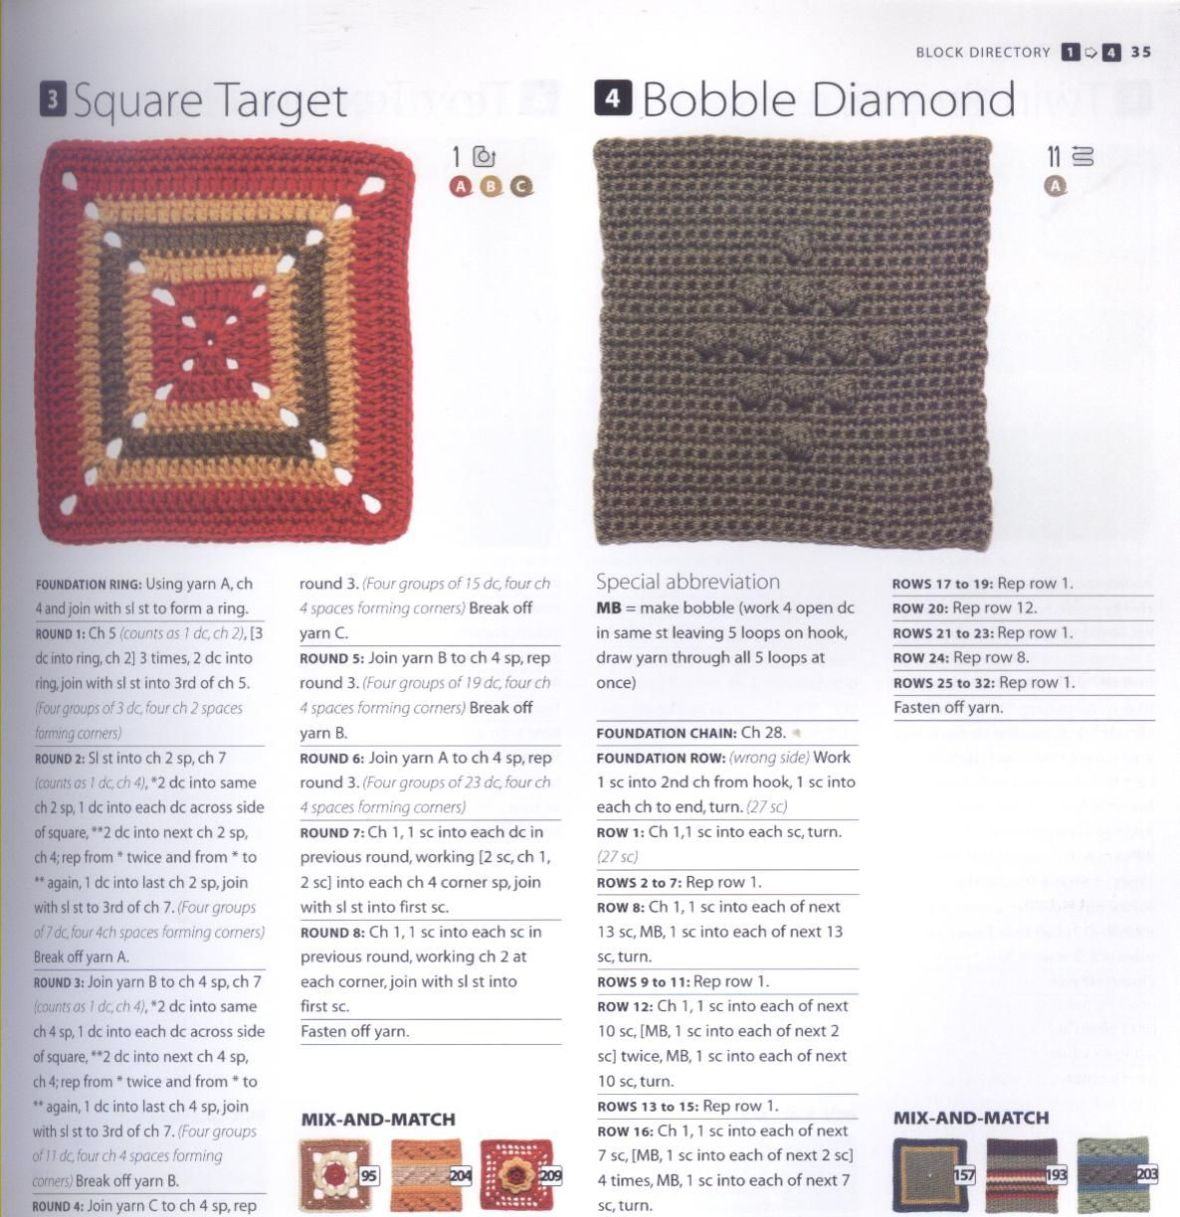 200 Crocheted Blocks for blankets, throws & Afghans 035